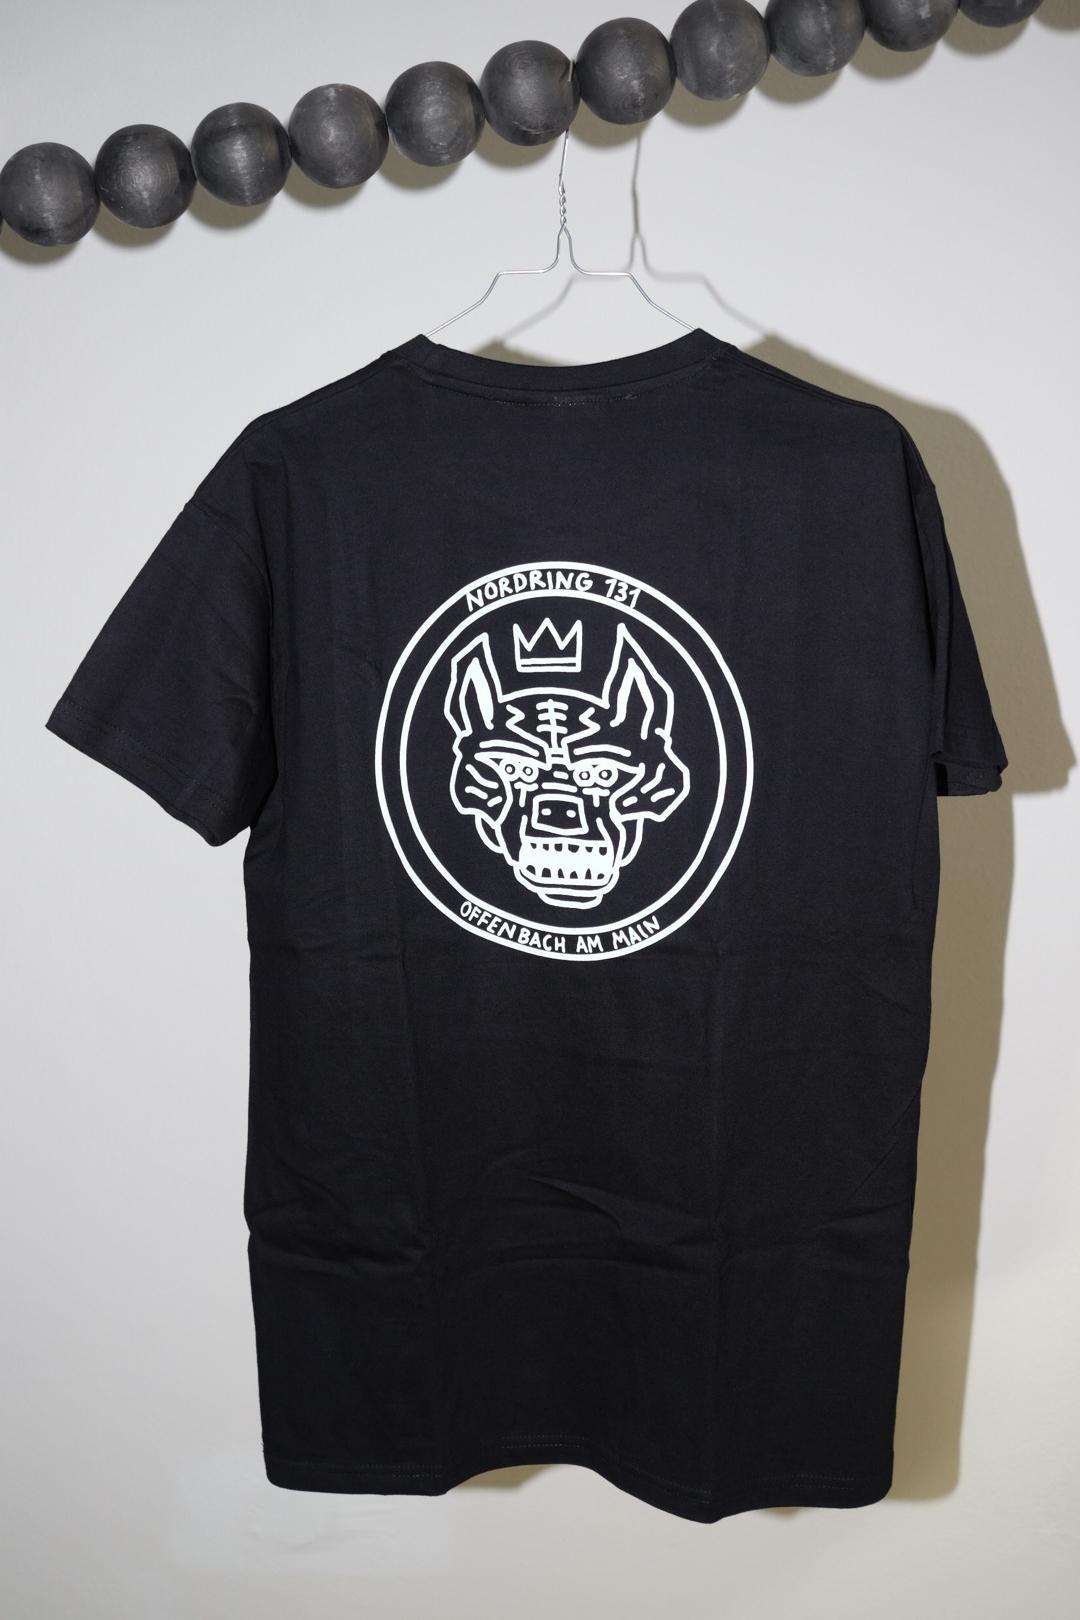 Nordring 131 T-Shirt - 2